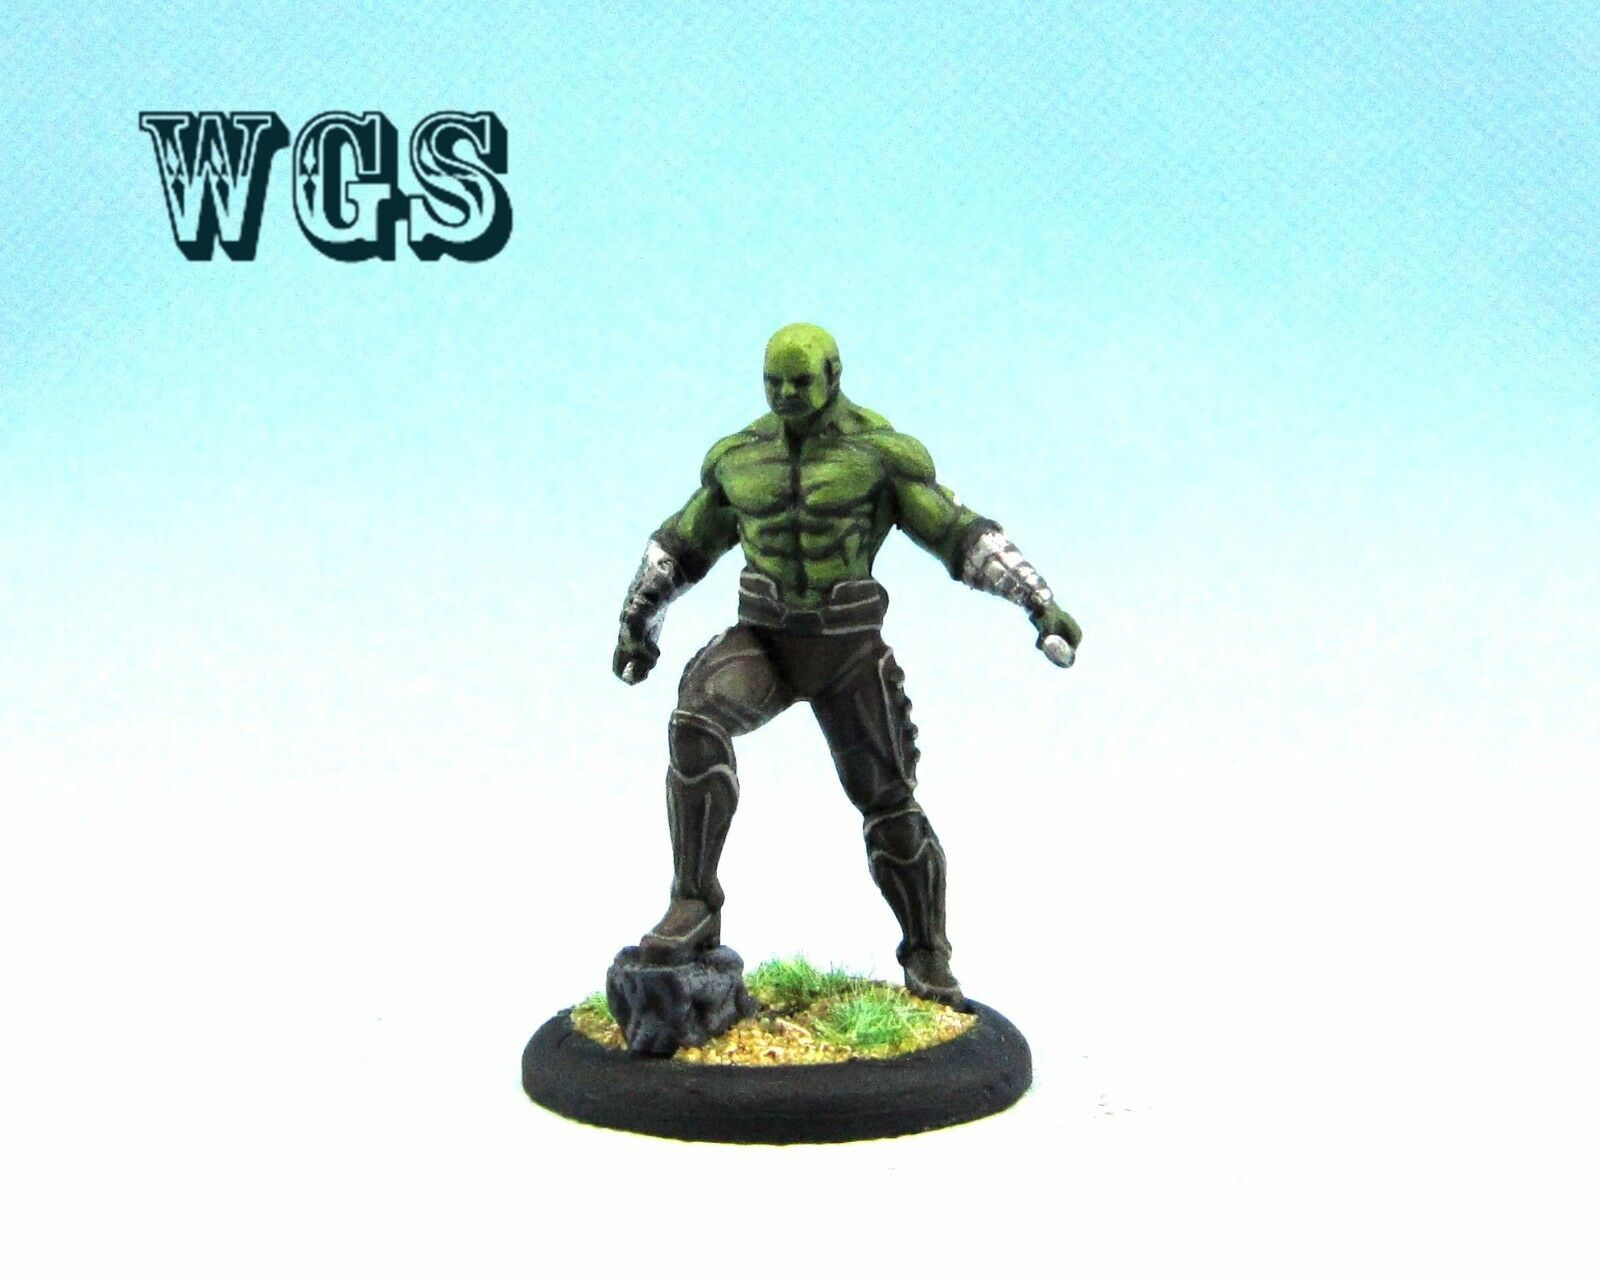 35 mm Knight Models WGS peint  Marvel Universe-Drax le ddstroyer KM016  vente en ligne